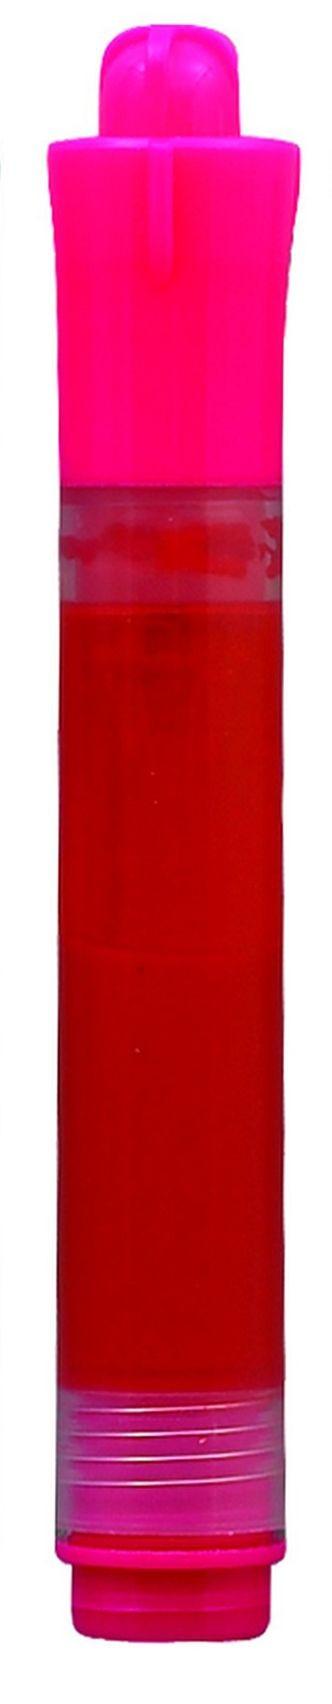 Winco MBM-R Deluxe Neon Marker, Red